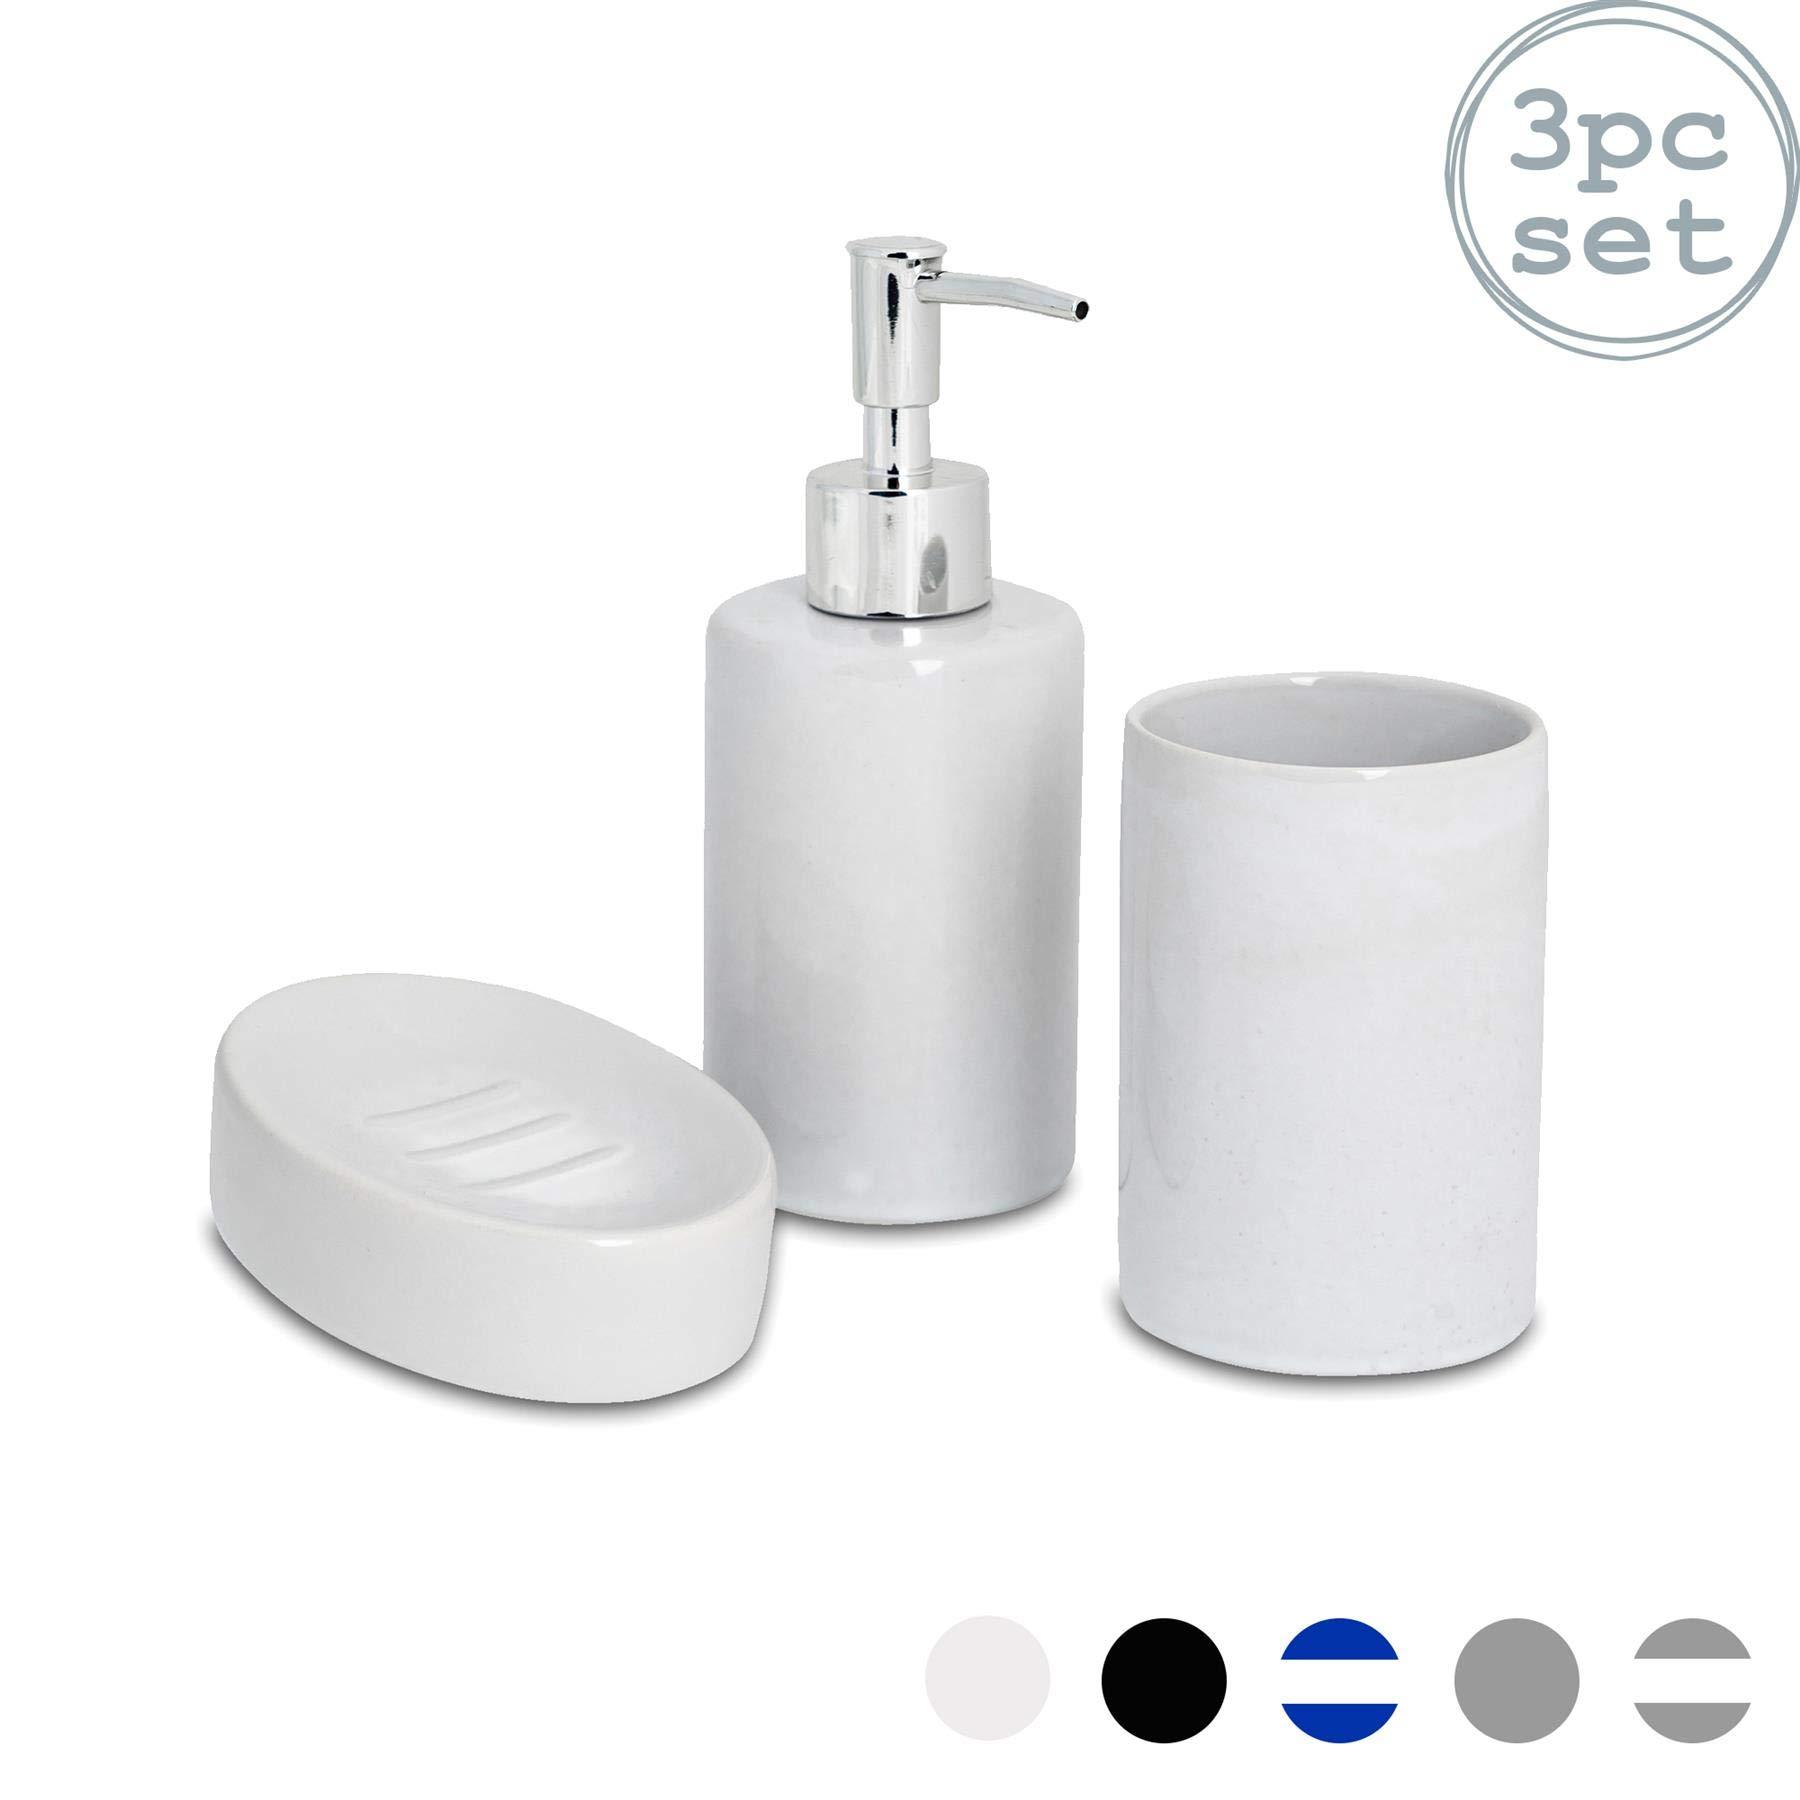 Harbour Housewares 3 Piece Bathroom Accessories Set Soap Dispenser Dish And Toothbrush Holder White Buy Online In Burundi At Burundi Desertcart Com Productid 47950167